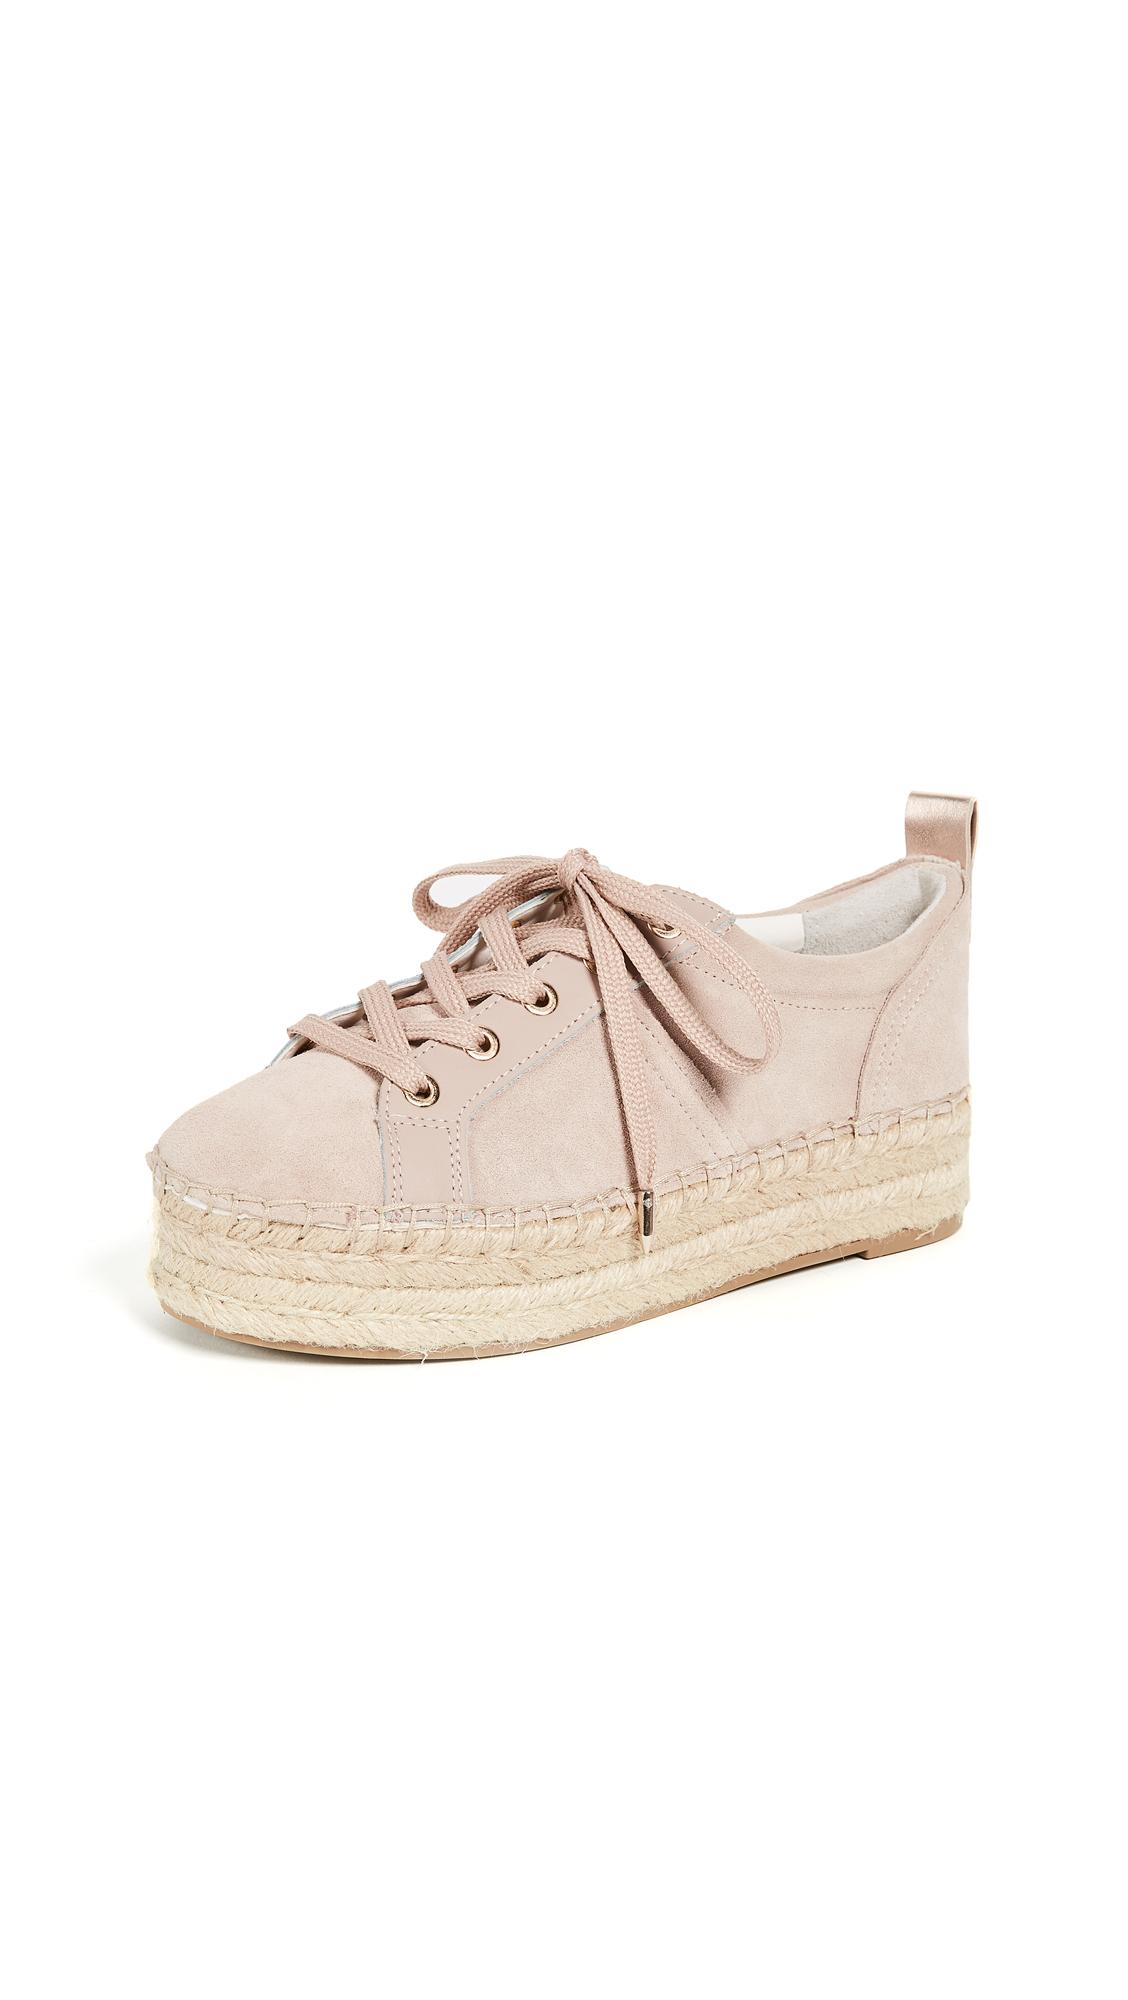 Sam Edelman Carleigh Platform Espadrille Sneakers - Blush